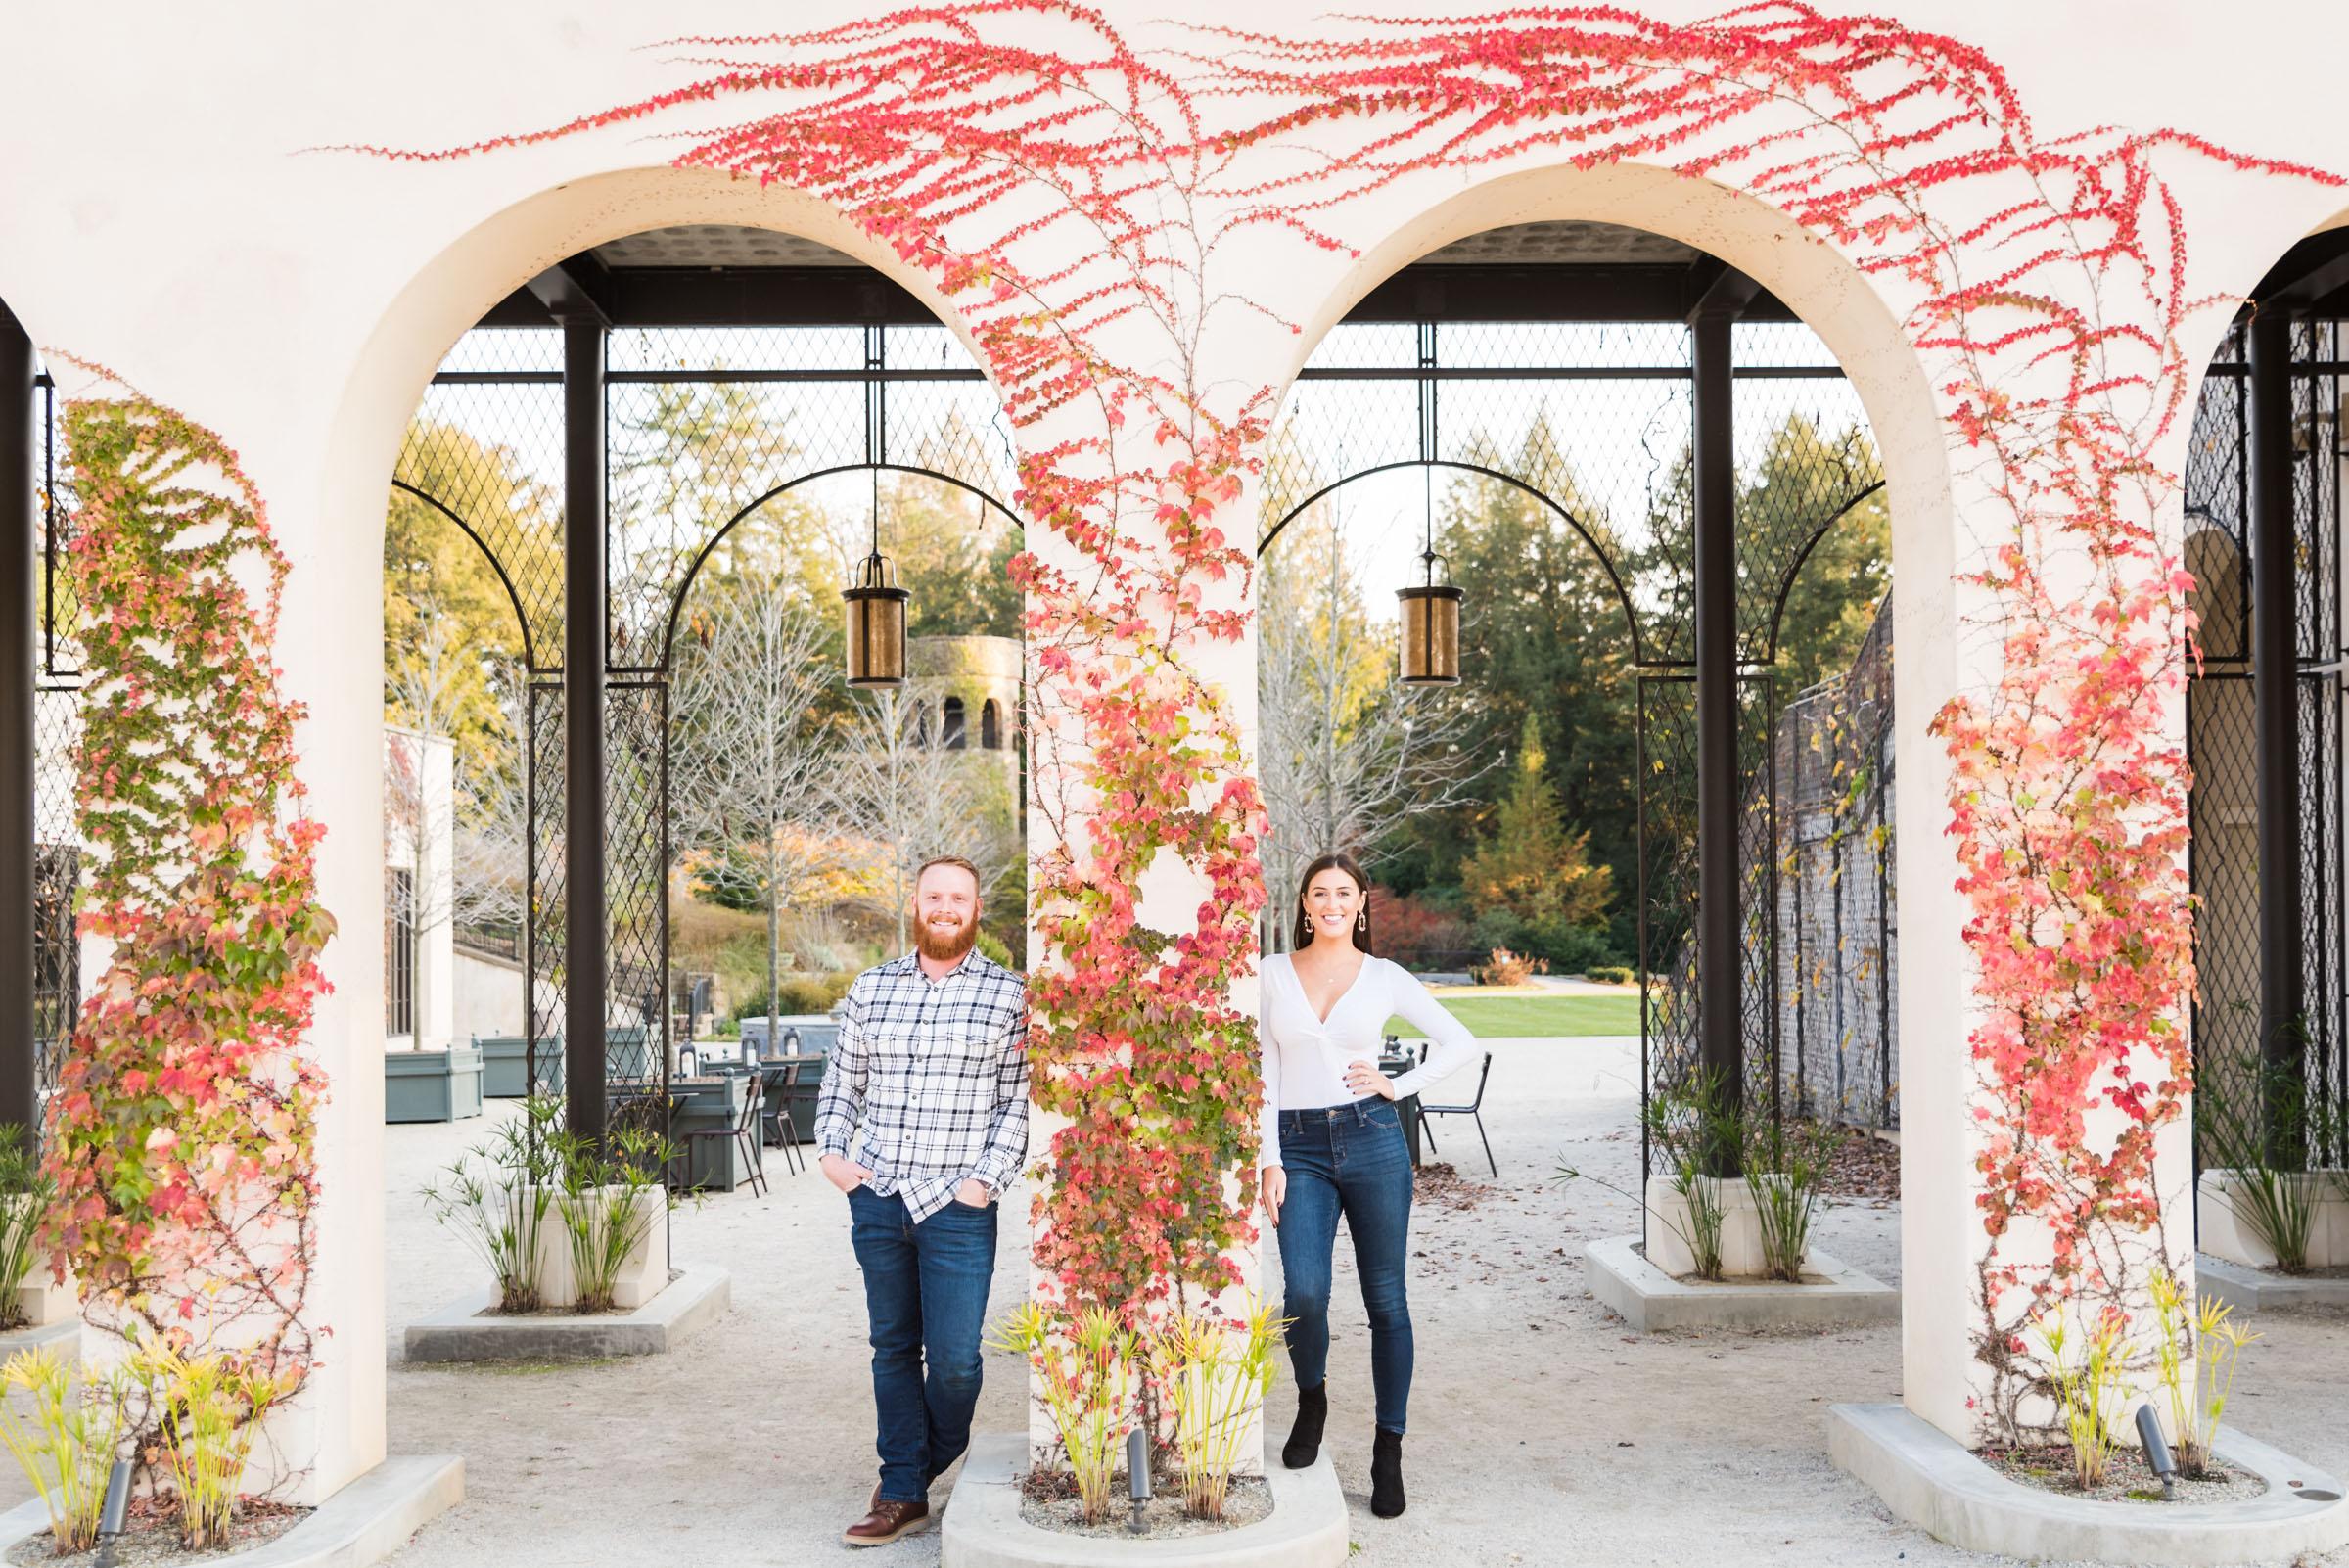 Longwood-Gardens-engagement-photos-1